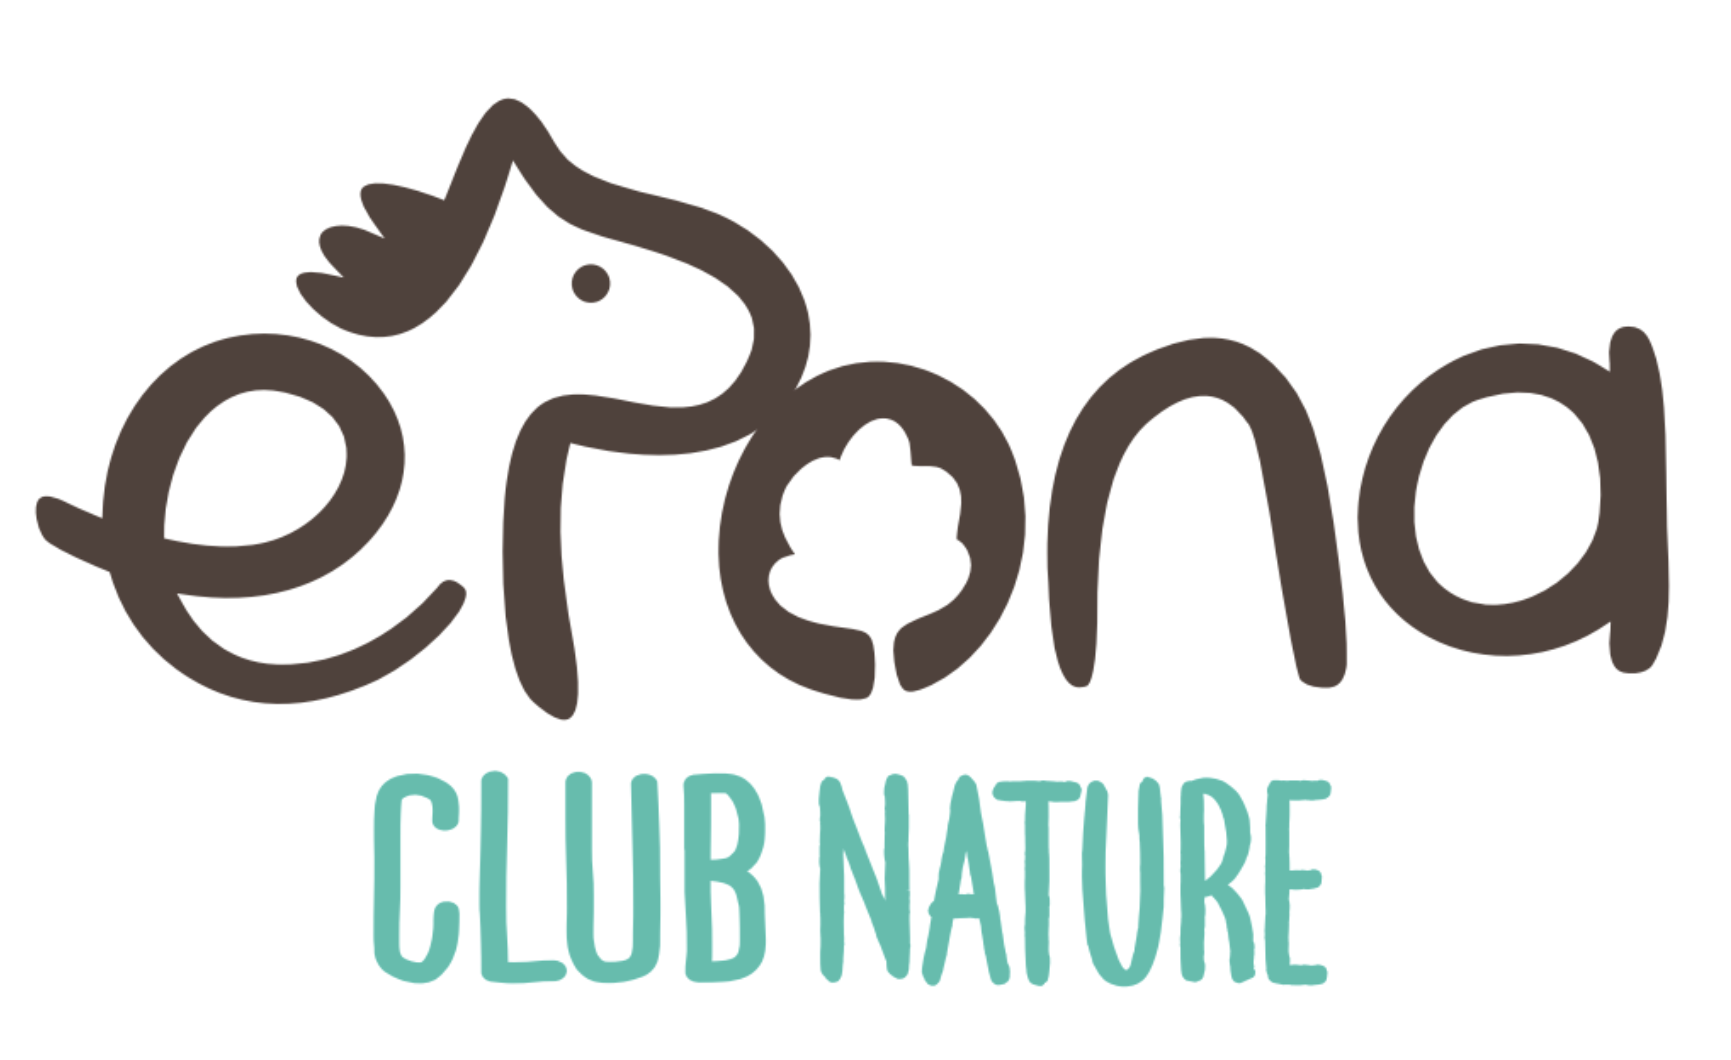 Epona Club Nature